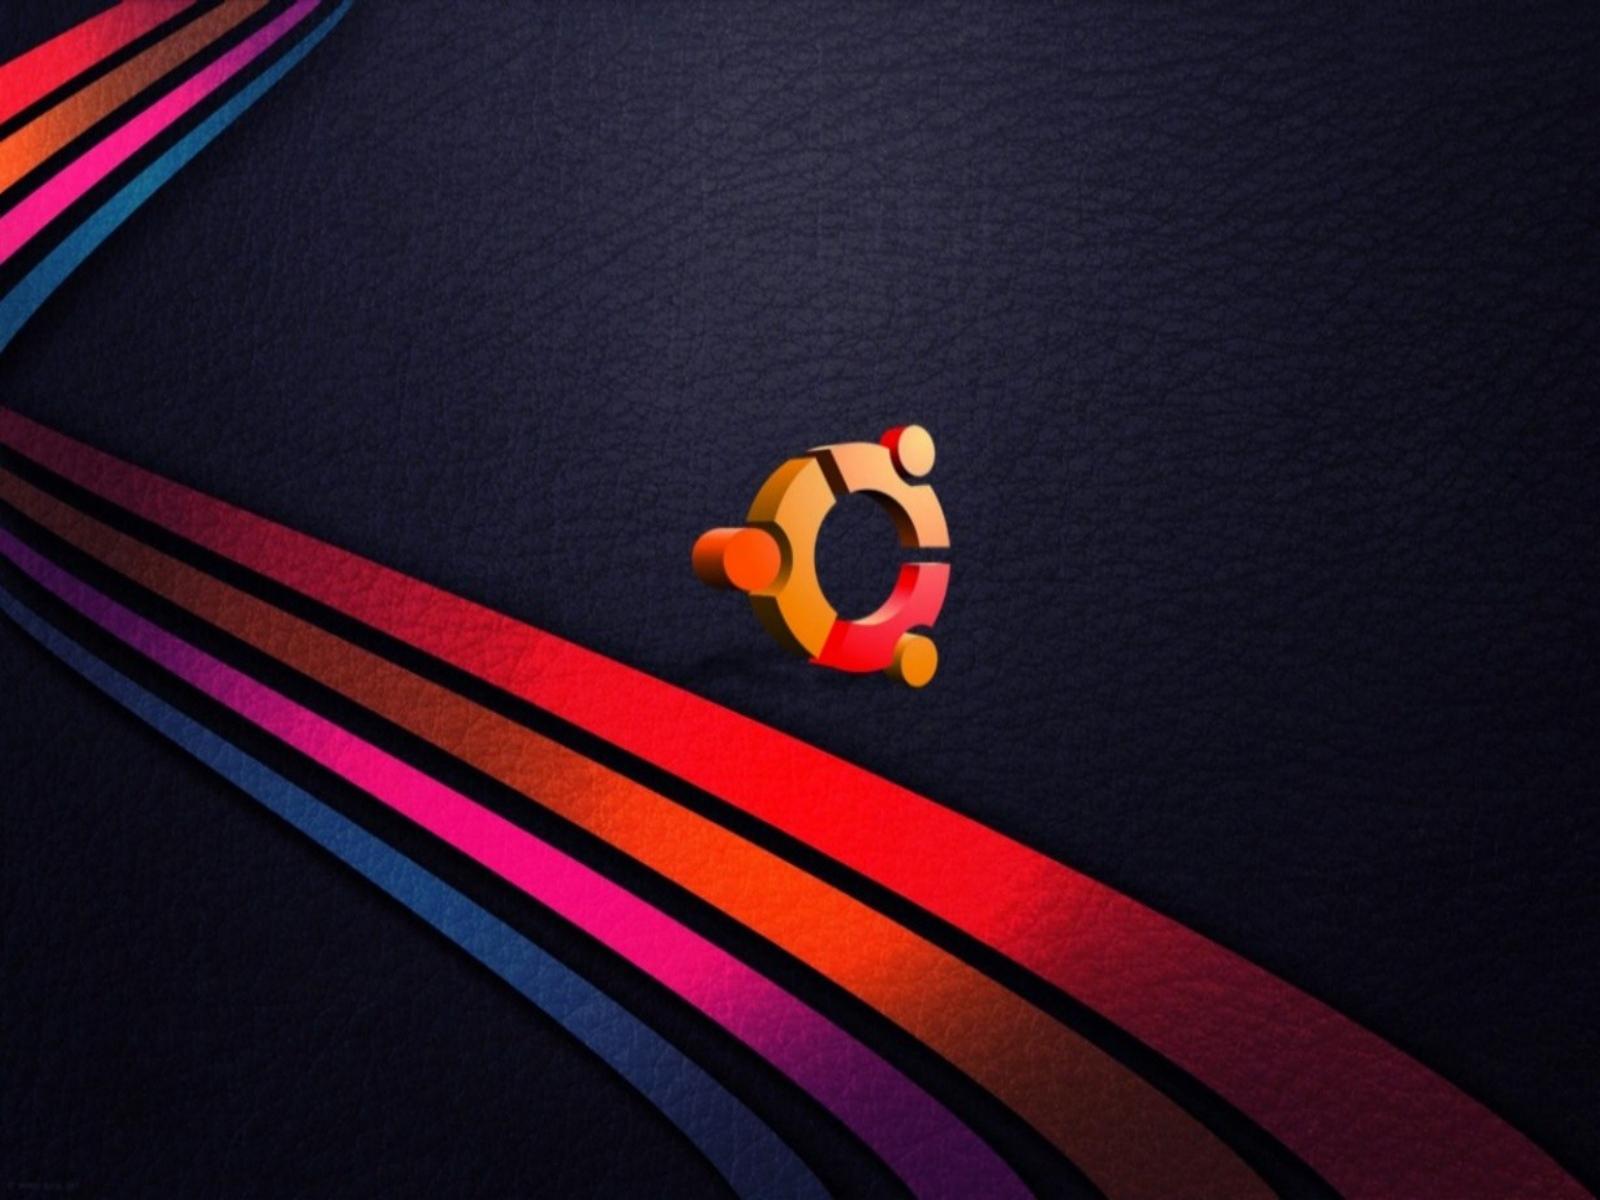 ubuntu precise pangolin wallpaper - photo #8